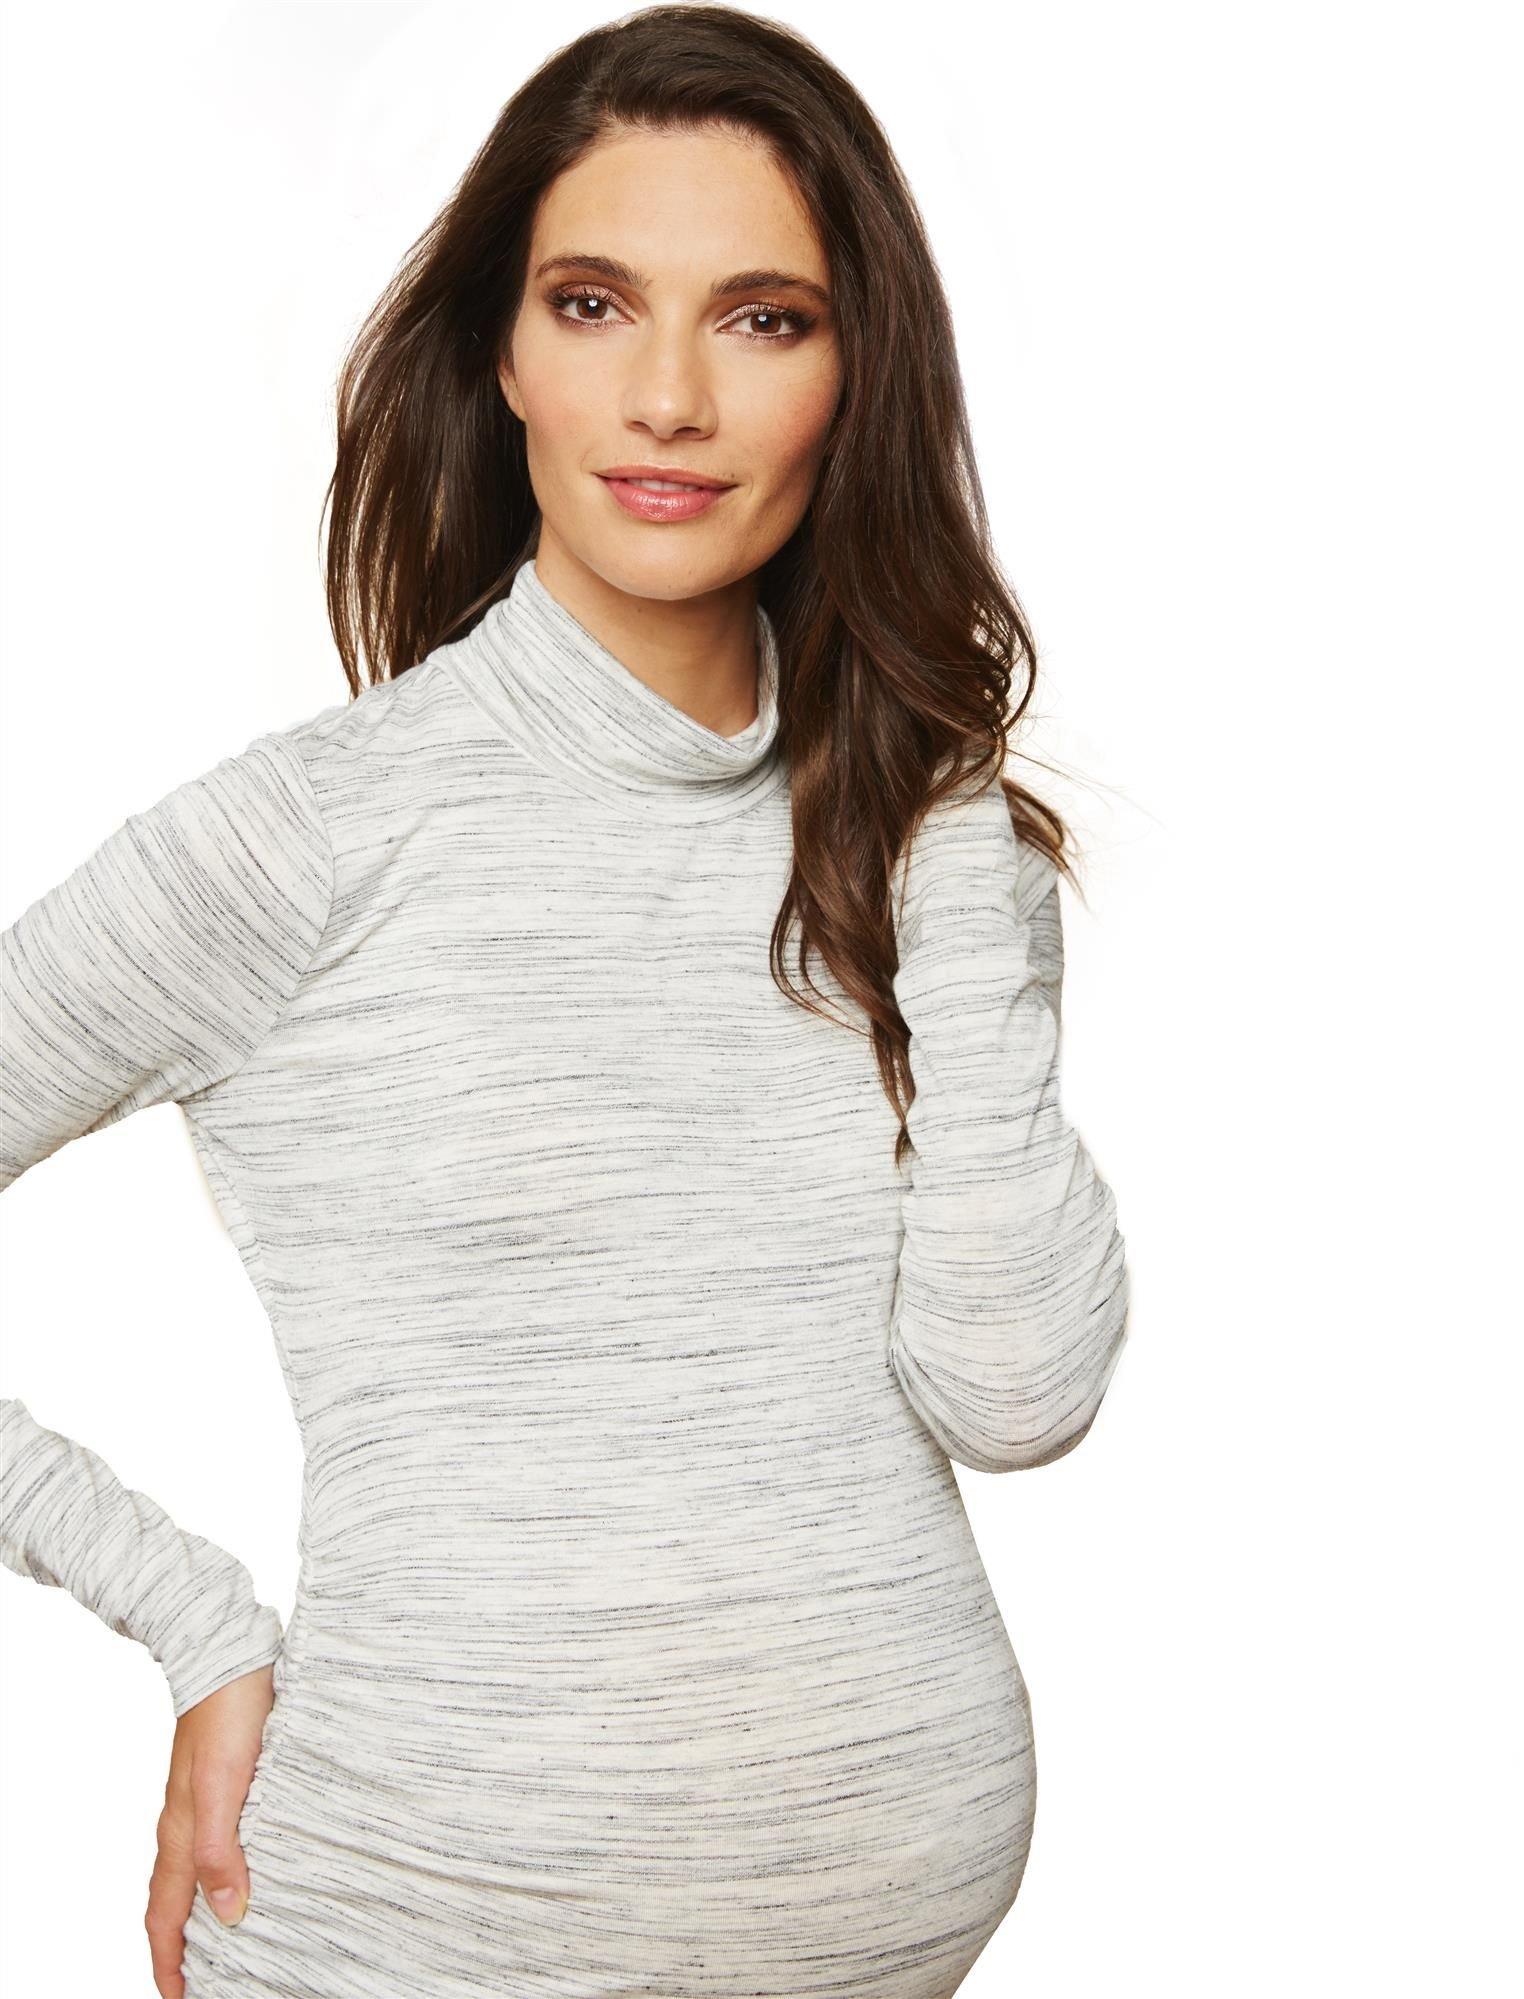 Motherhood Maternity Women's Maternity Long Sleeve Side Ruche Turtleneck Knit Top, Grey Space Dye, Medium by Motherhood Maternity (Image #1)